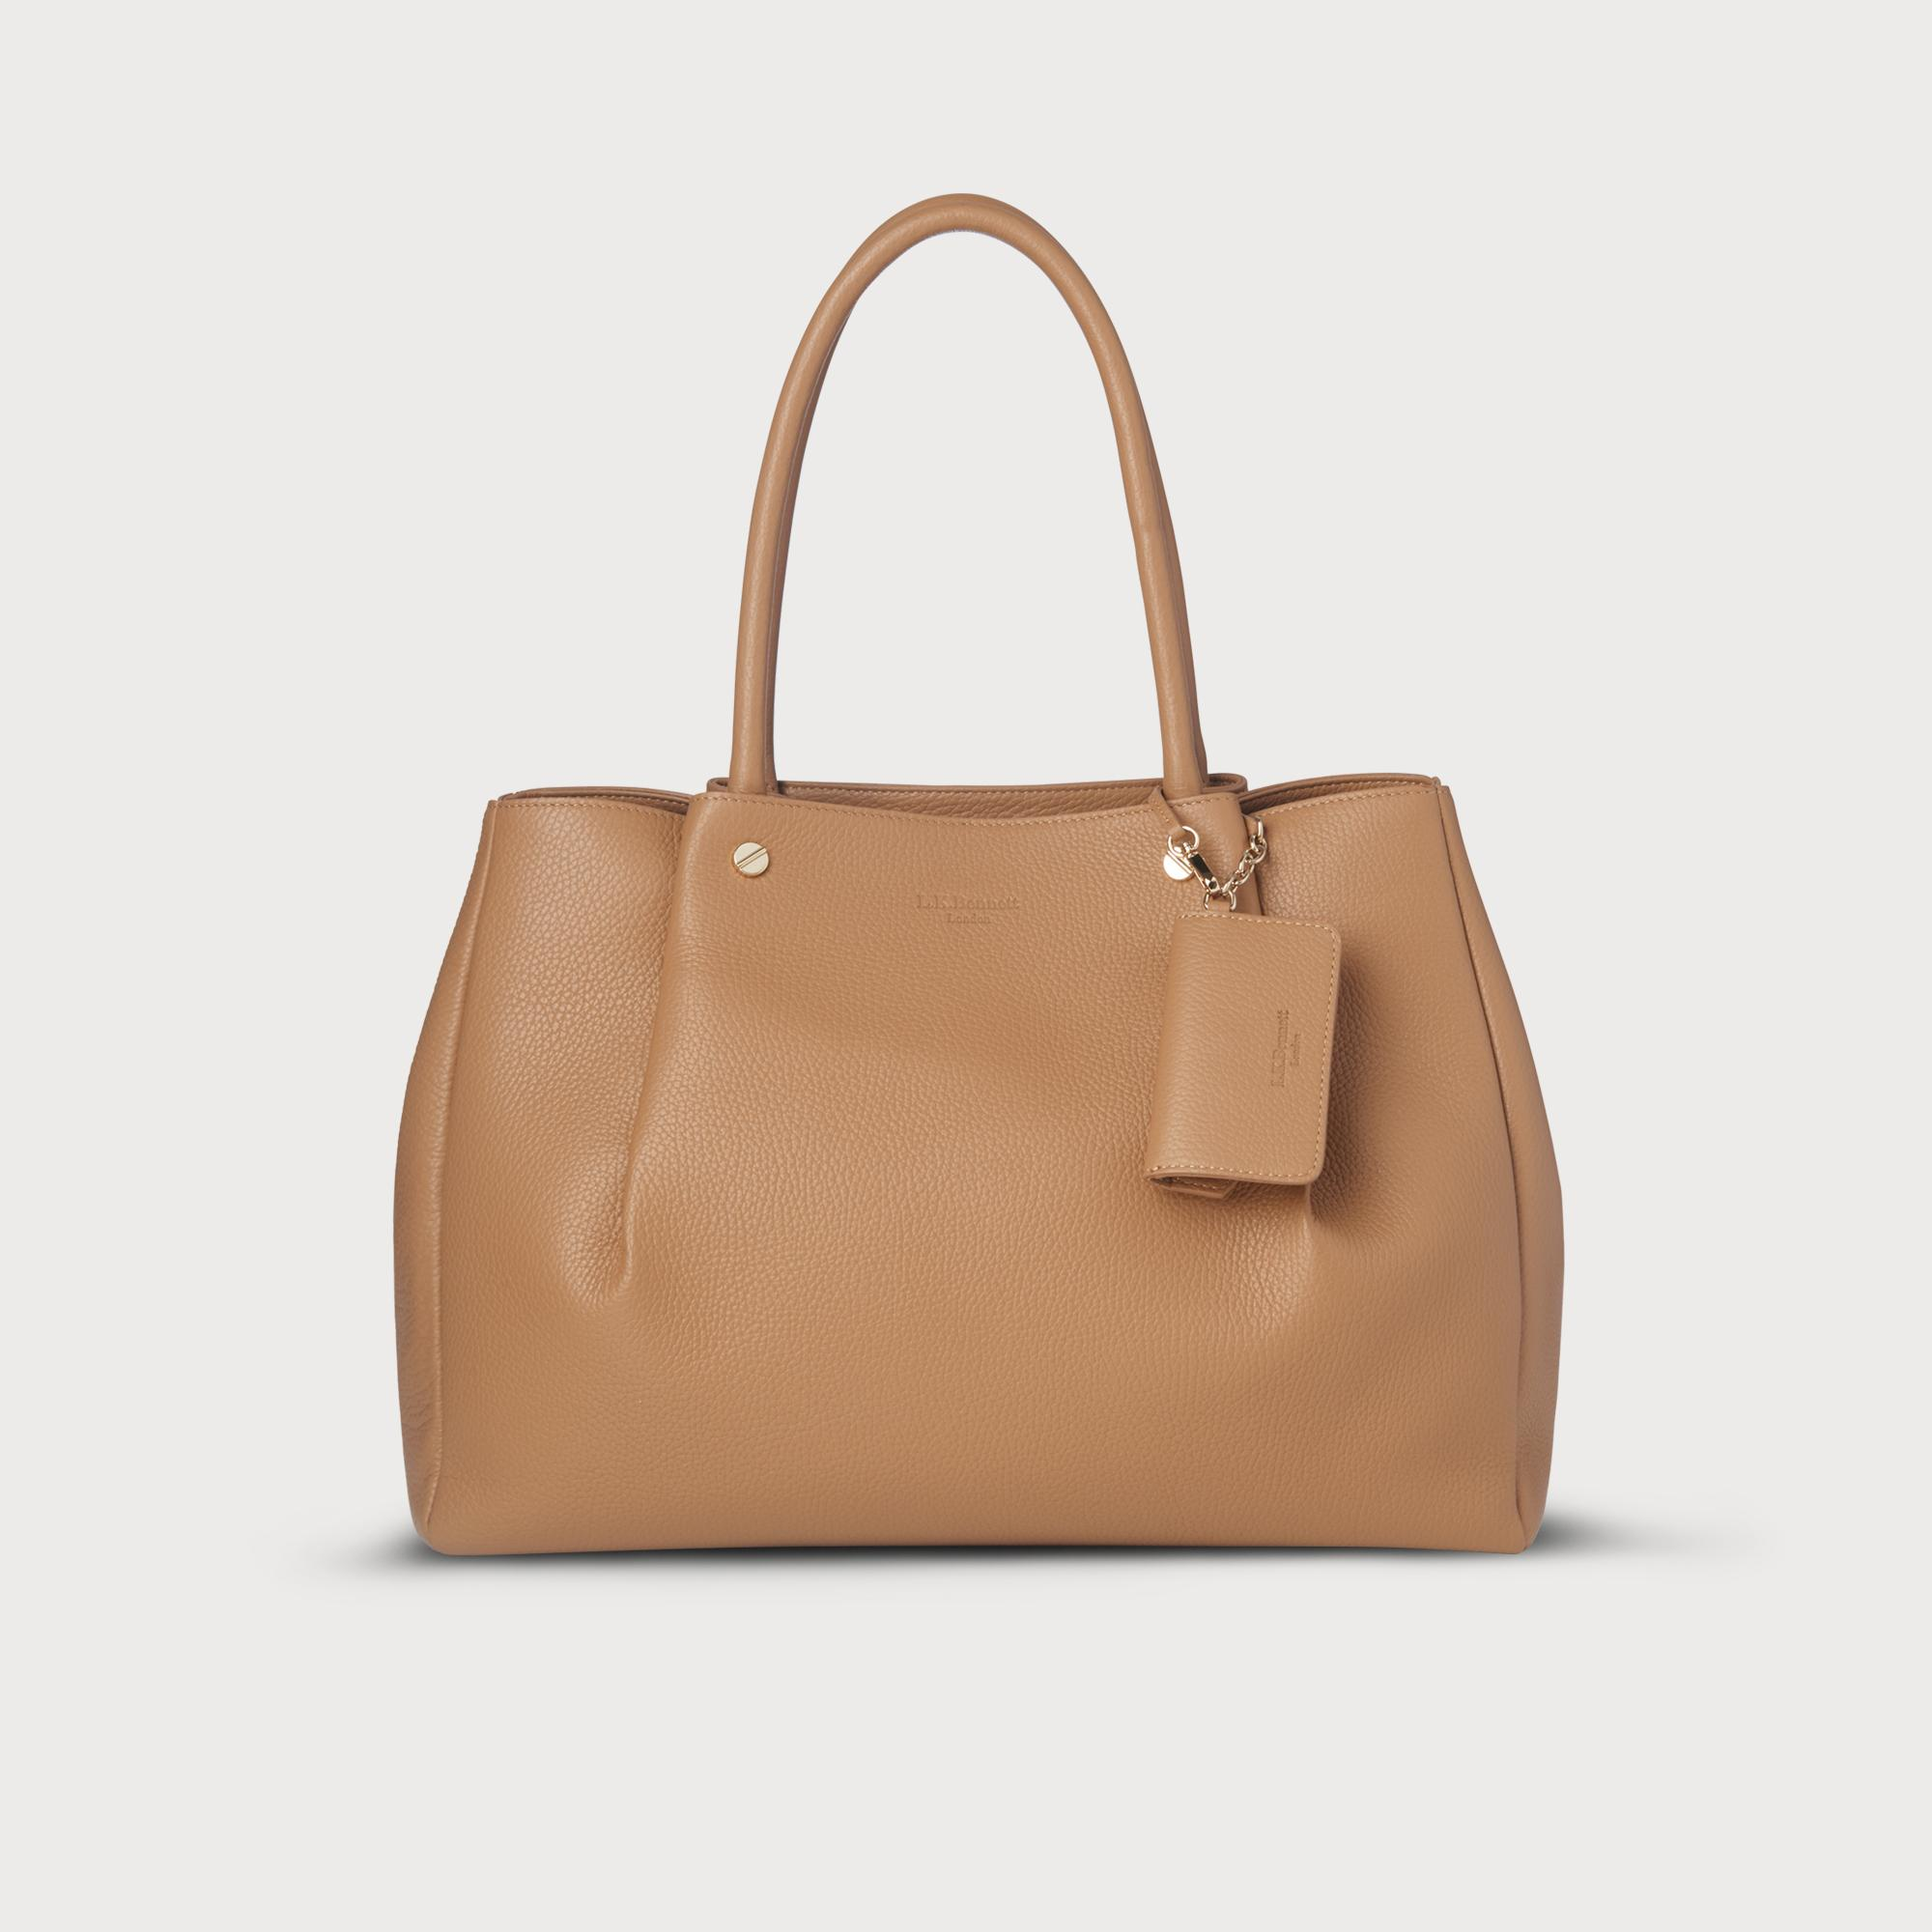 9ce10f331c6b Regan Tan Leather Tote Bag